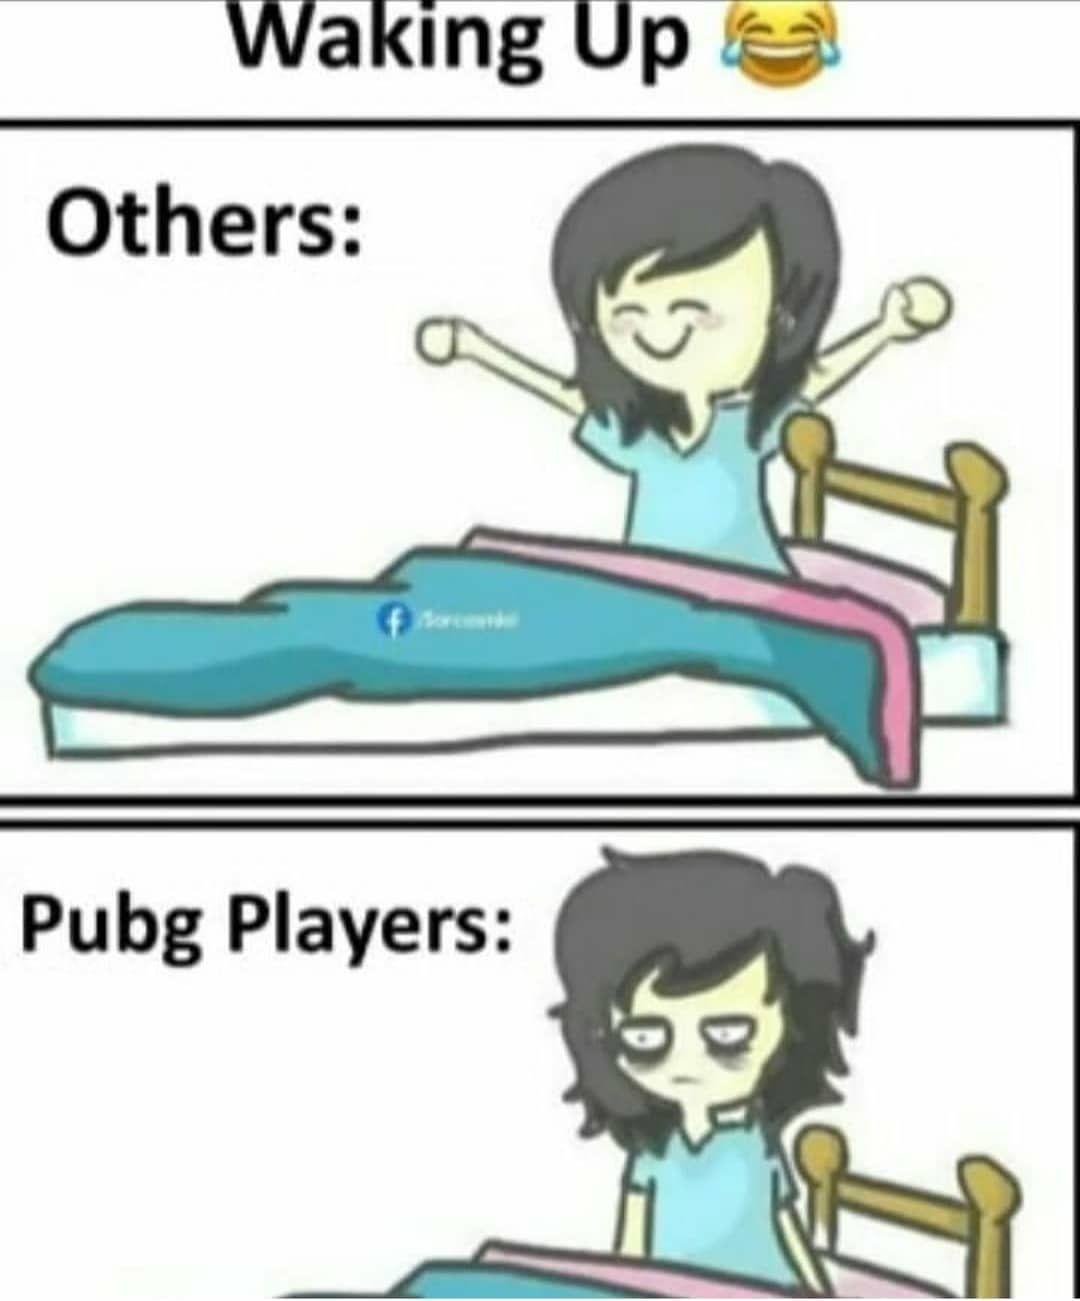 Pubg Memes Cute Love Memes Funny Games Crazy Funny Memes